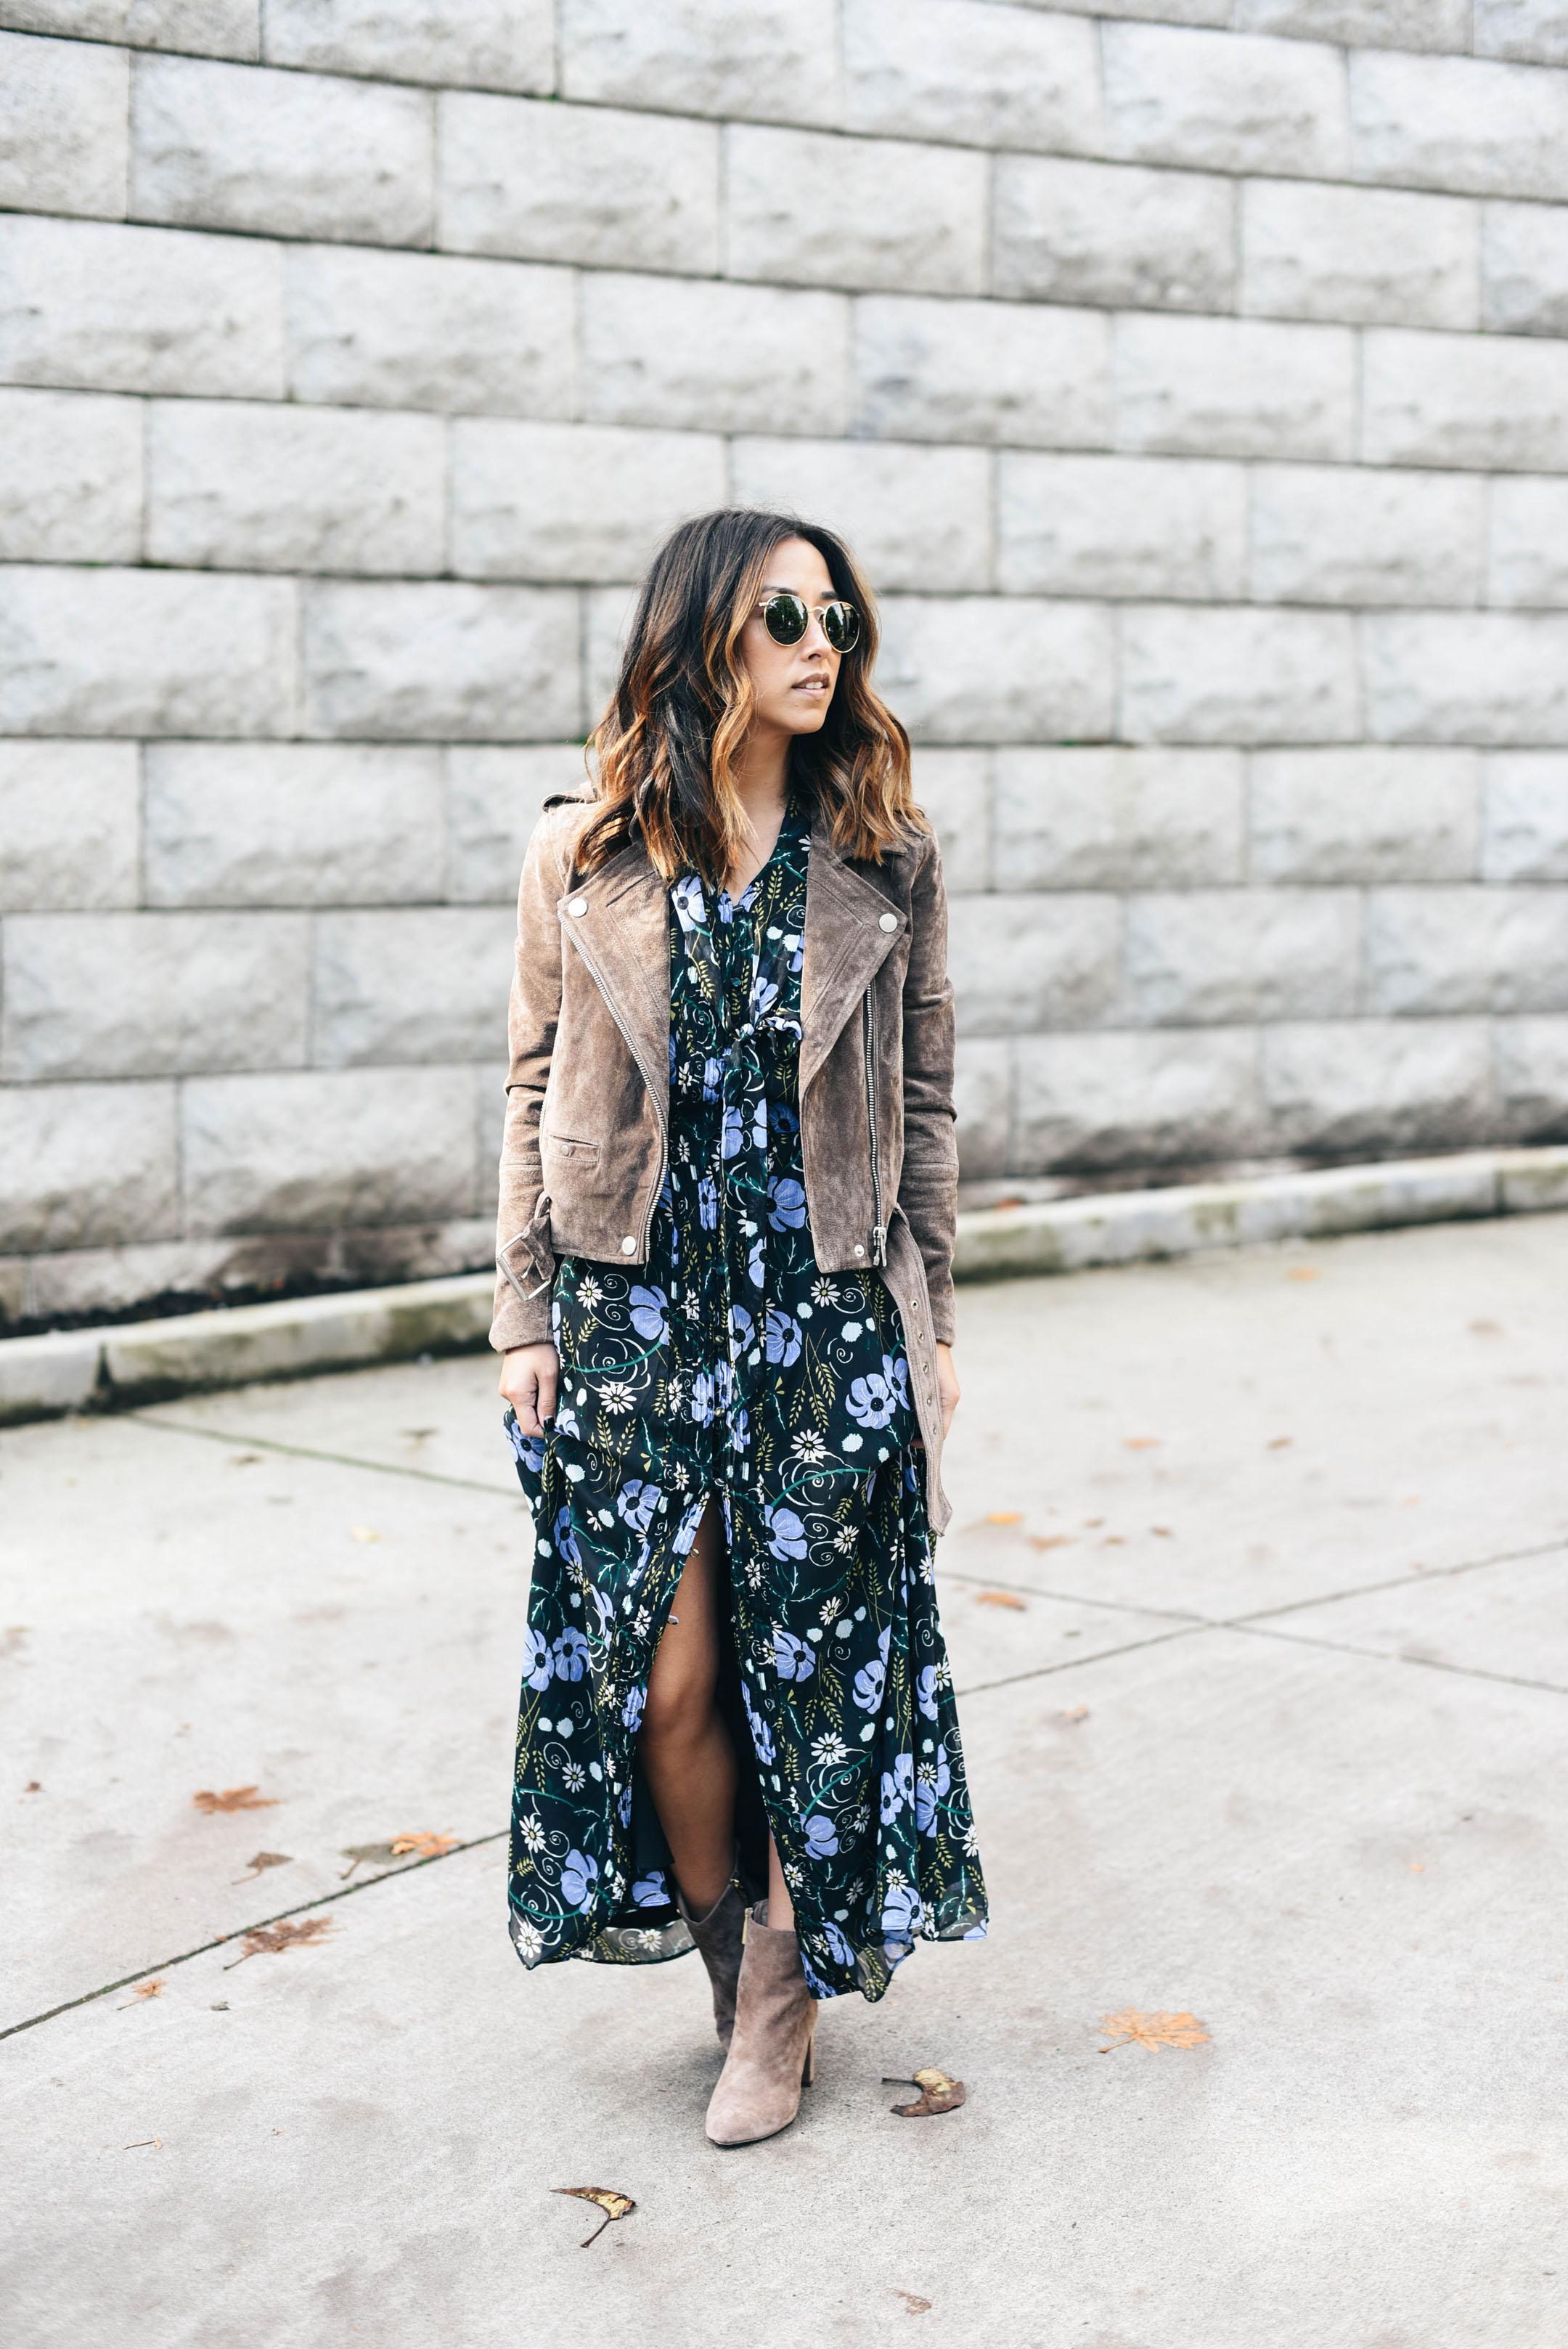 crystalin-marie-wearing-banana-republic-petite-floral-maxi-dress